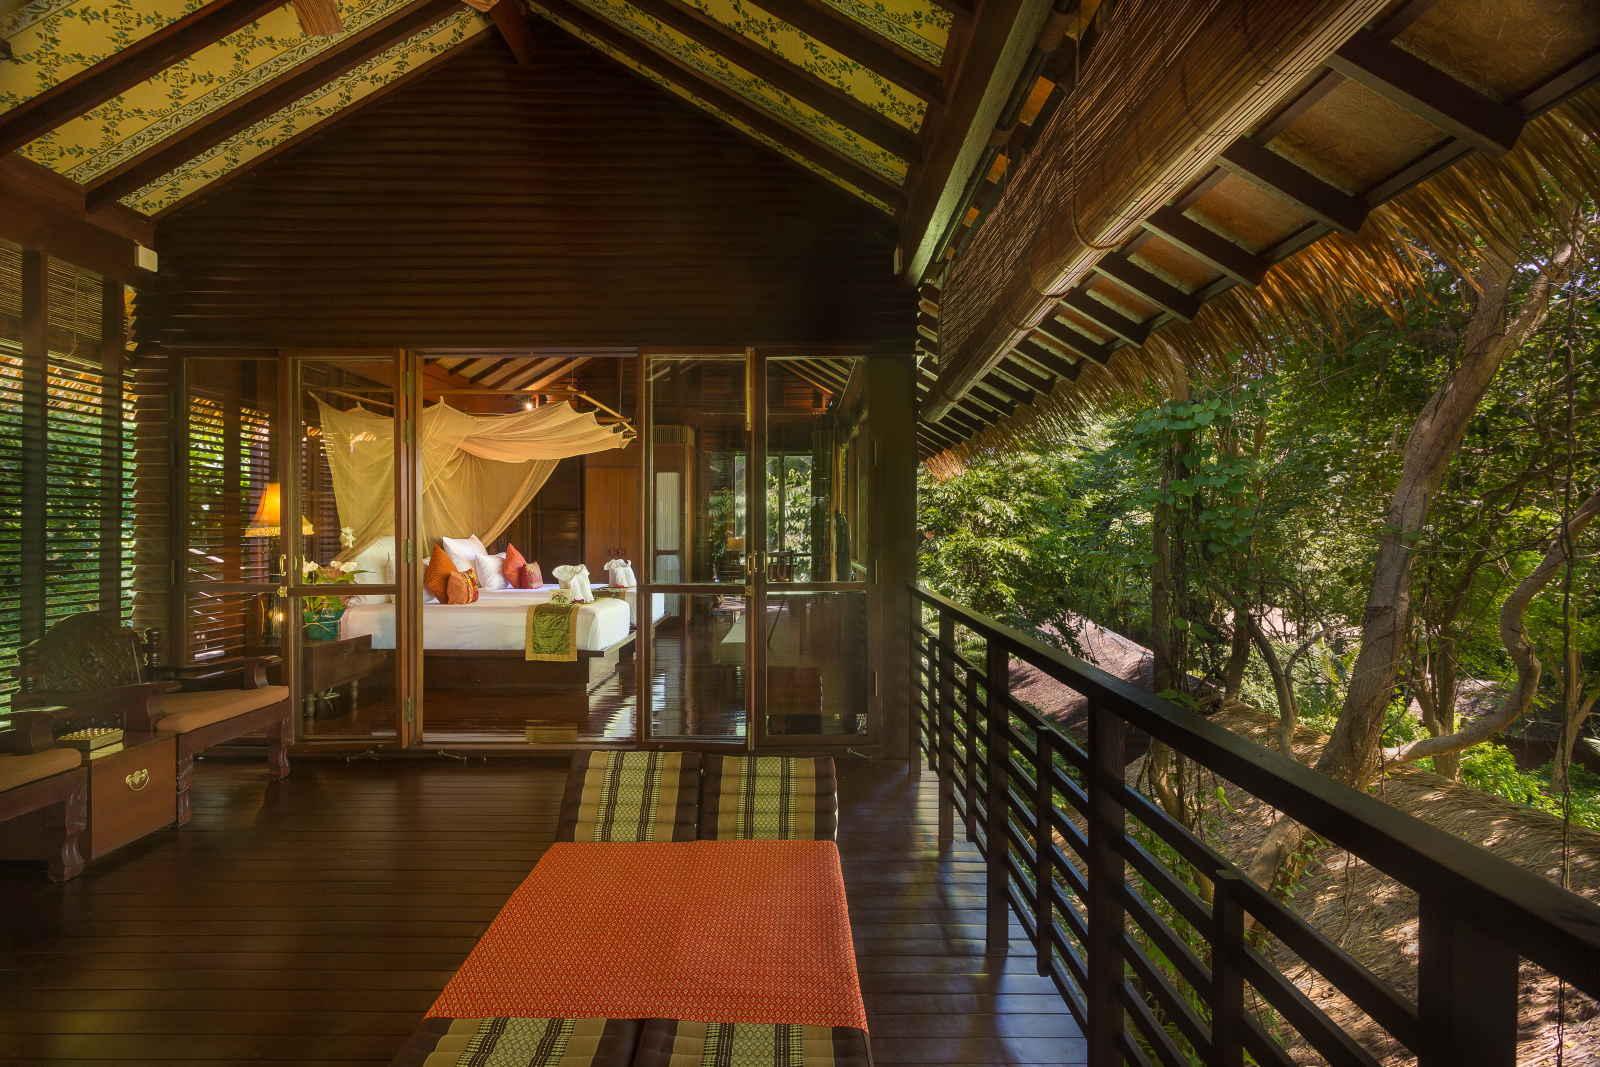 Thaïlande - Koh Phi Phi - Hôtel Zeavola Resort 5*